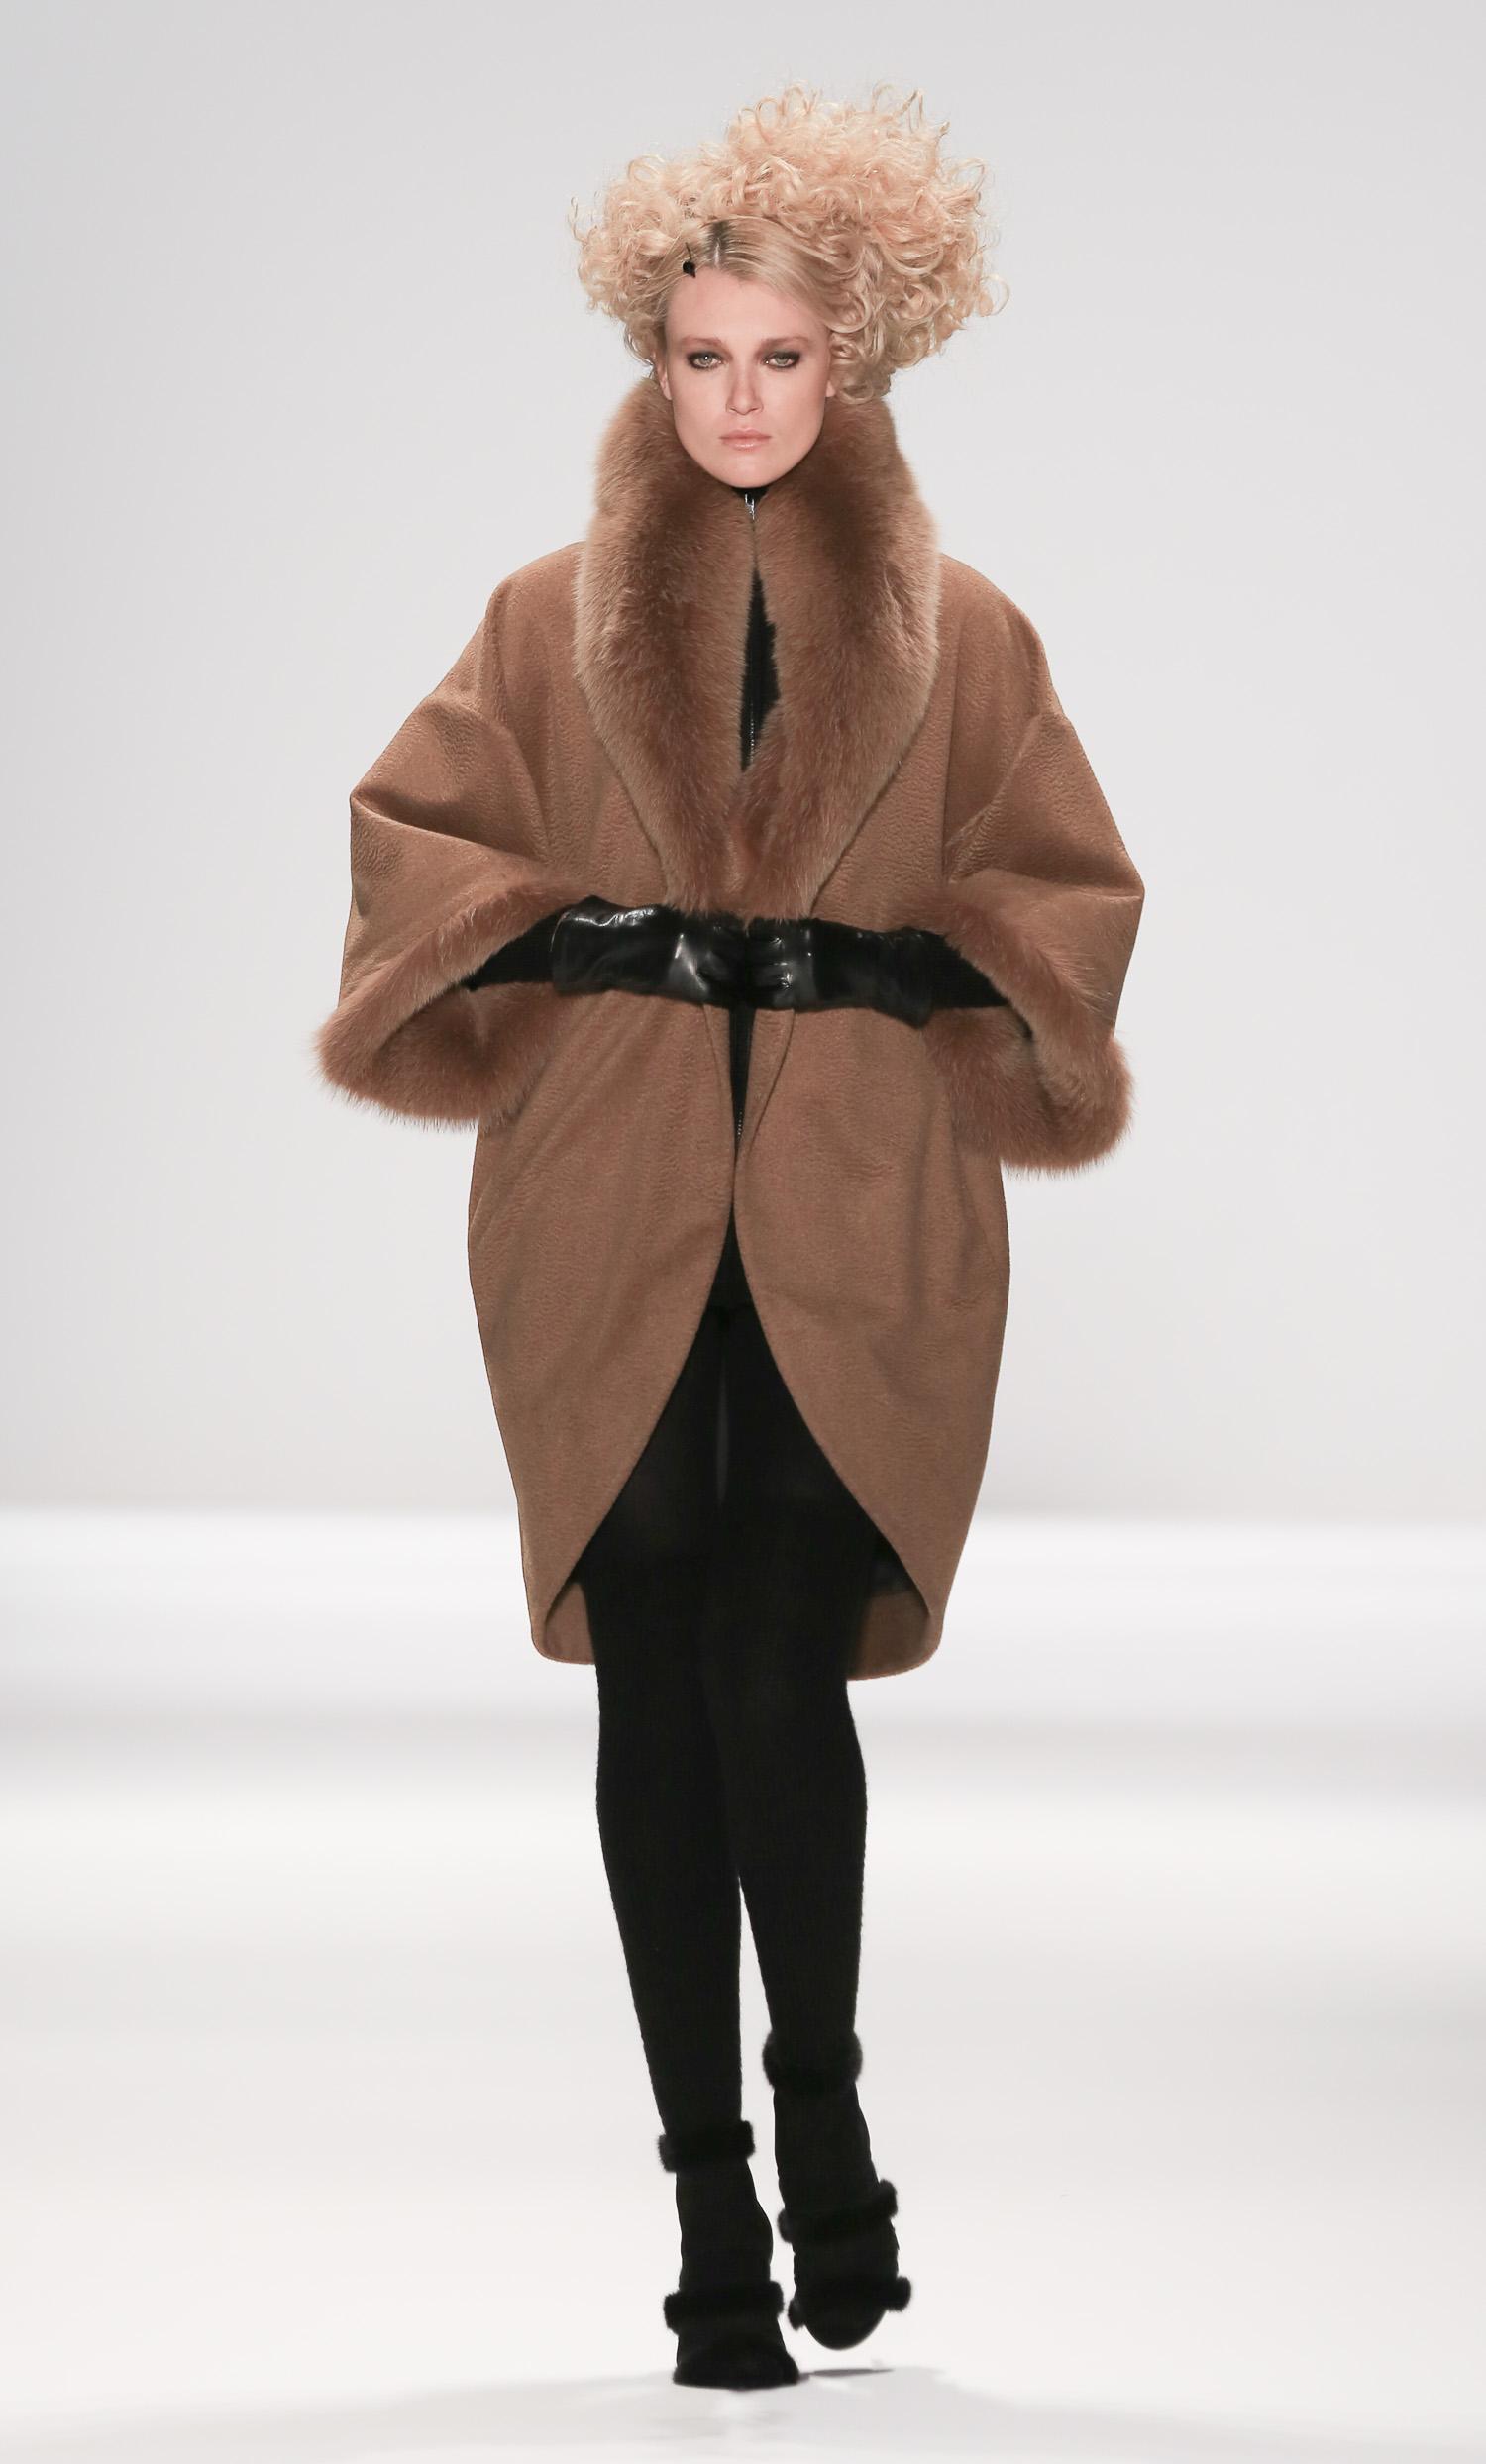 zang-toi-fashion-7394.jpg